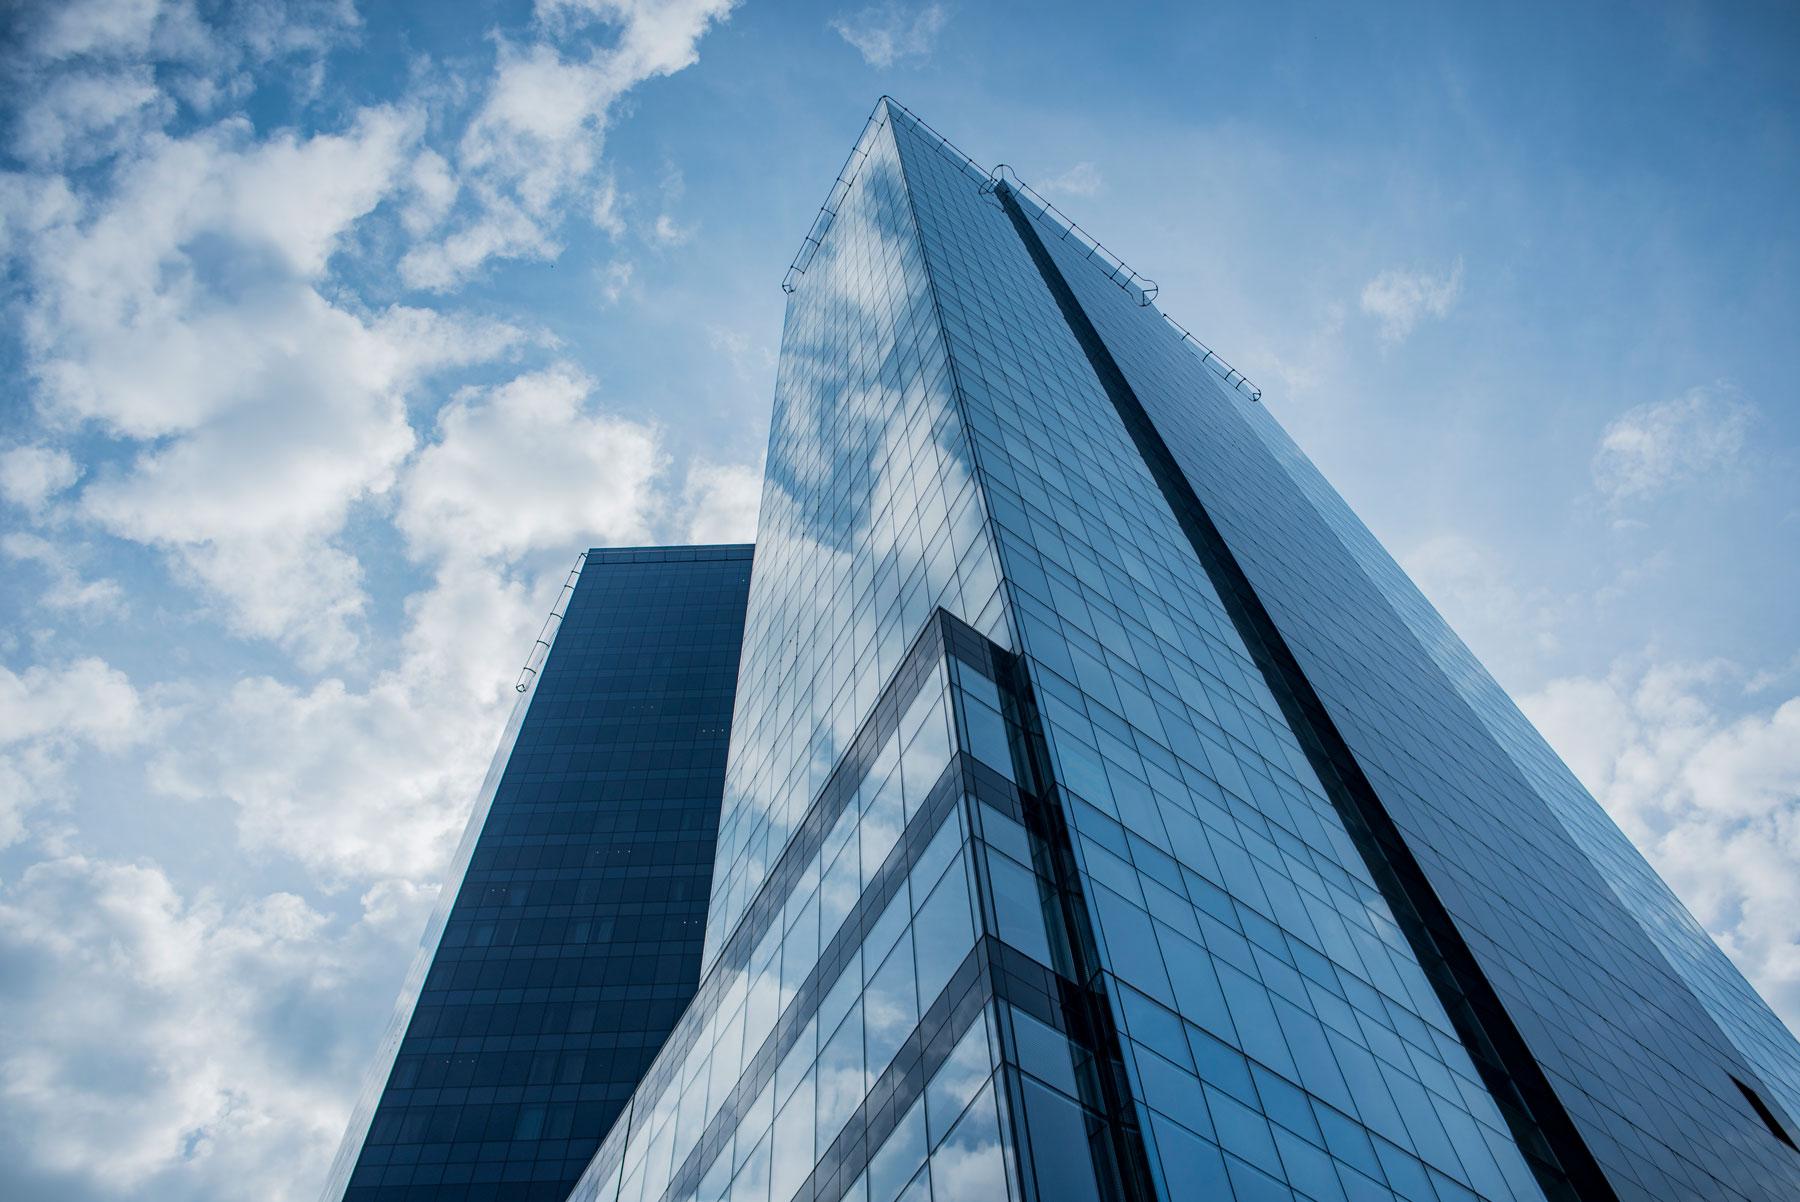 glass-sturcture-montreal-vitrerie-jl